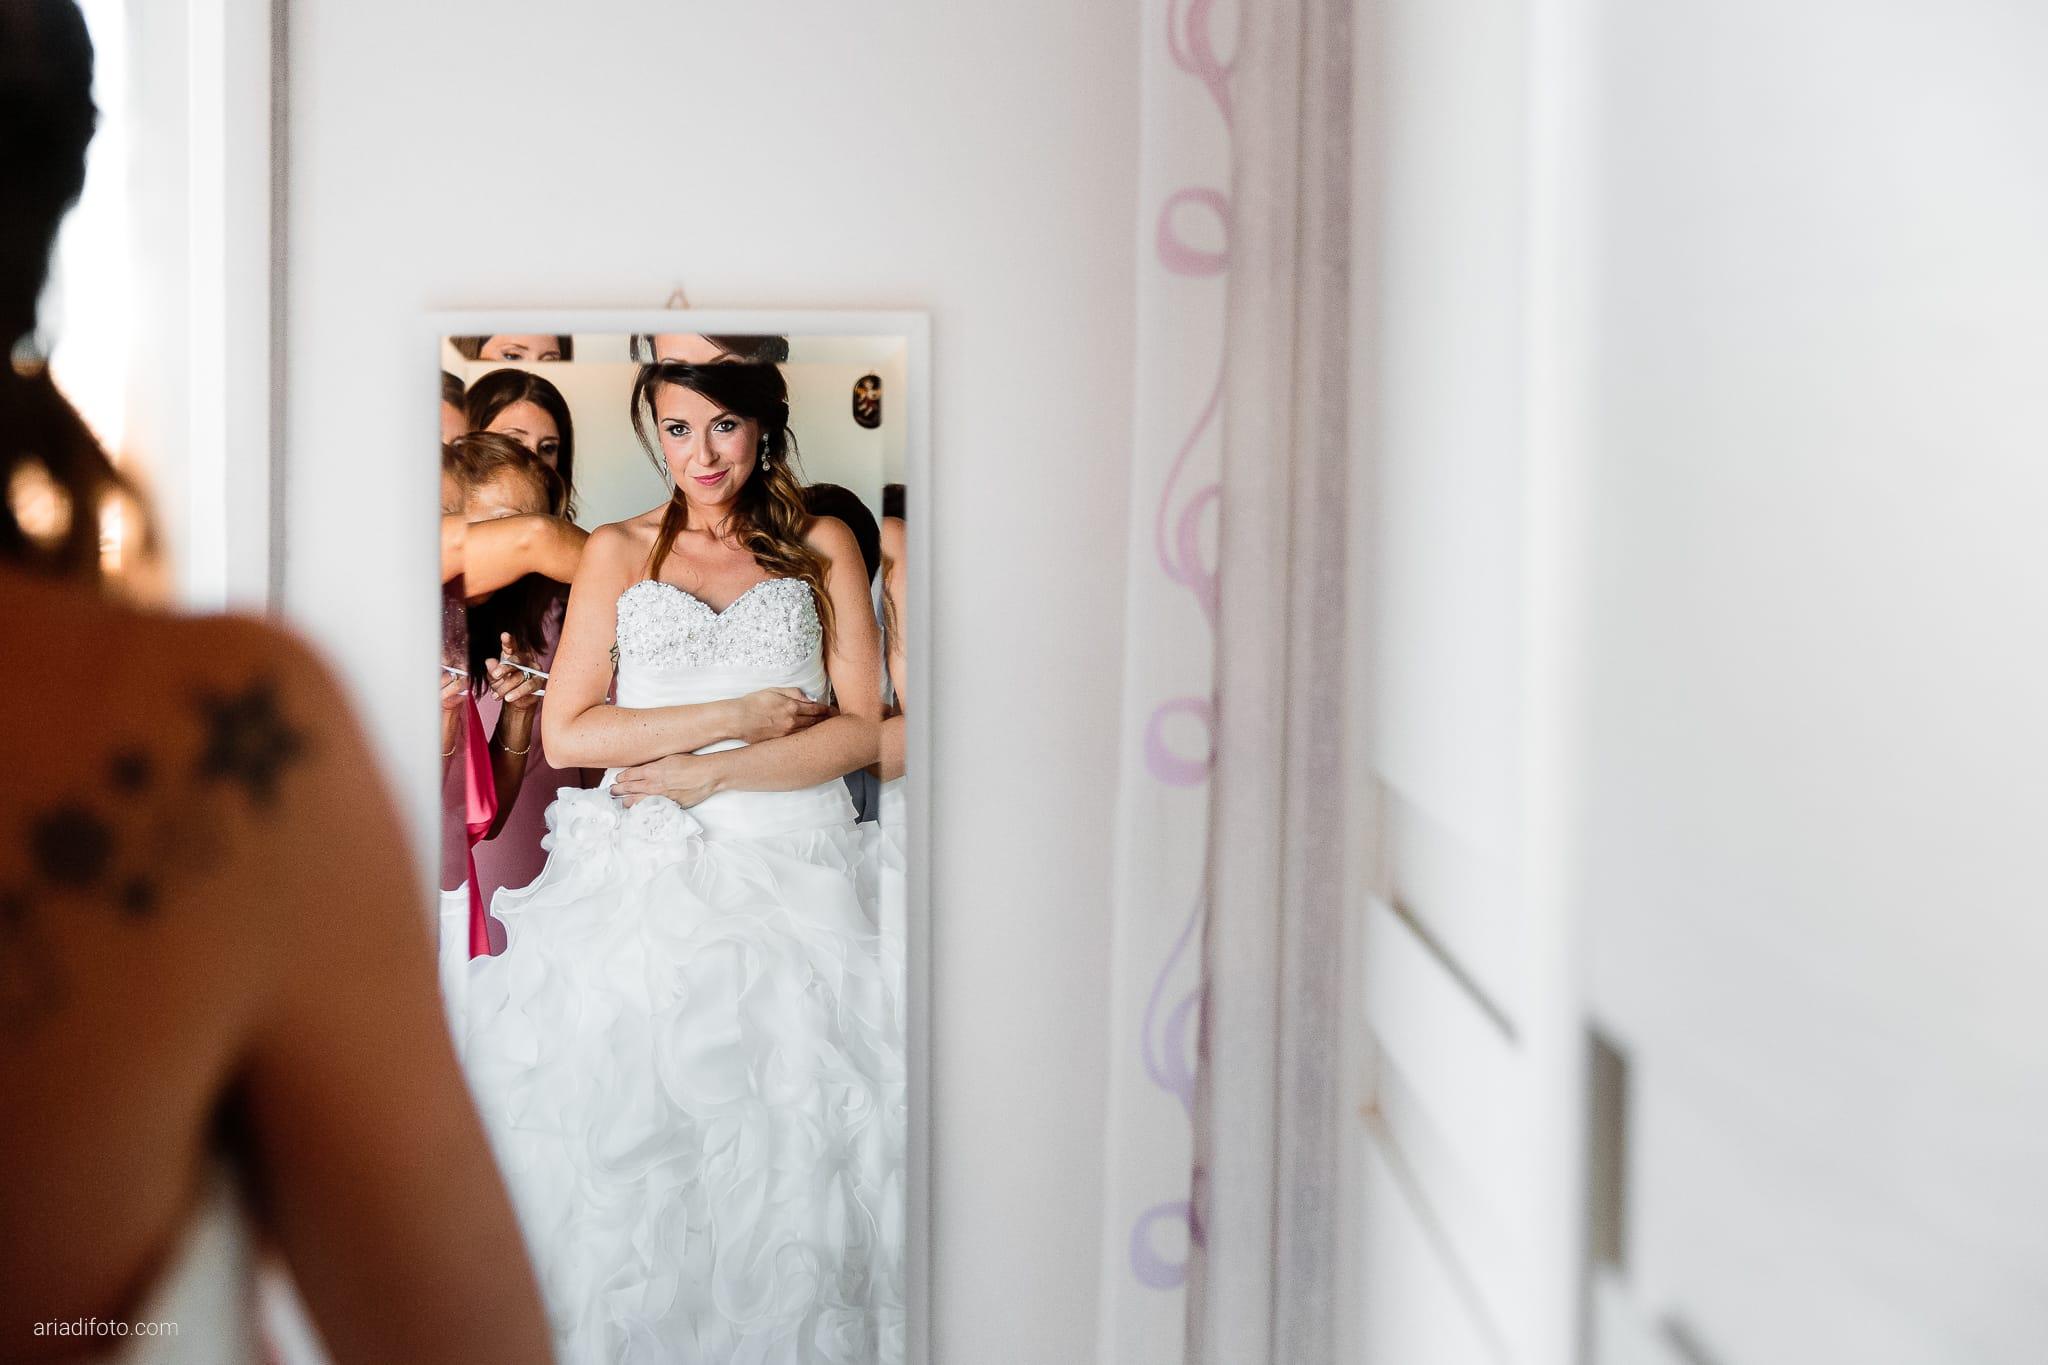 Melania Davide Matrimonio Monrupino Tavernetta Castello di Spessa Capriva Gorizia preparativi specchio riflesso